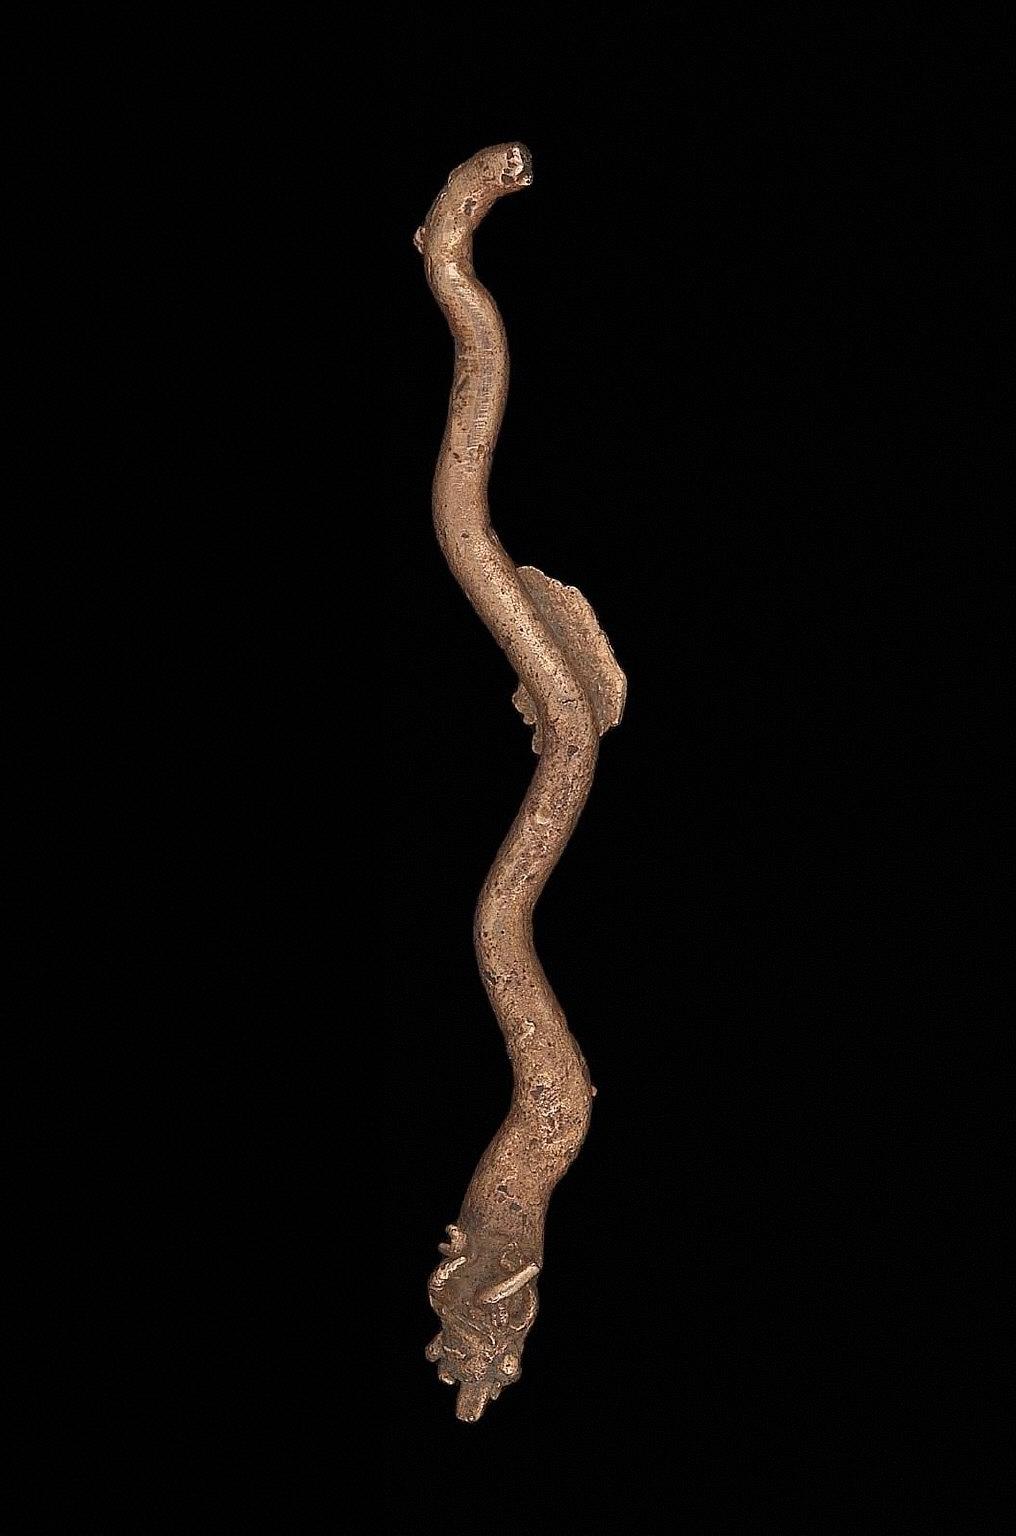 Deer-headed serpent effigy